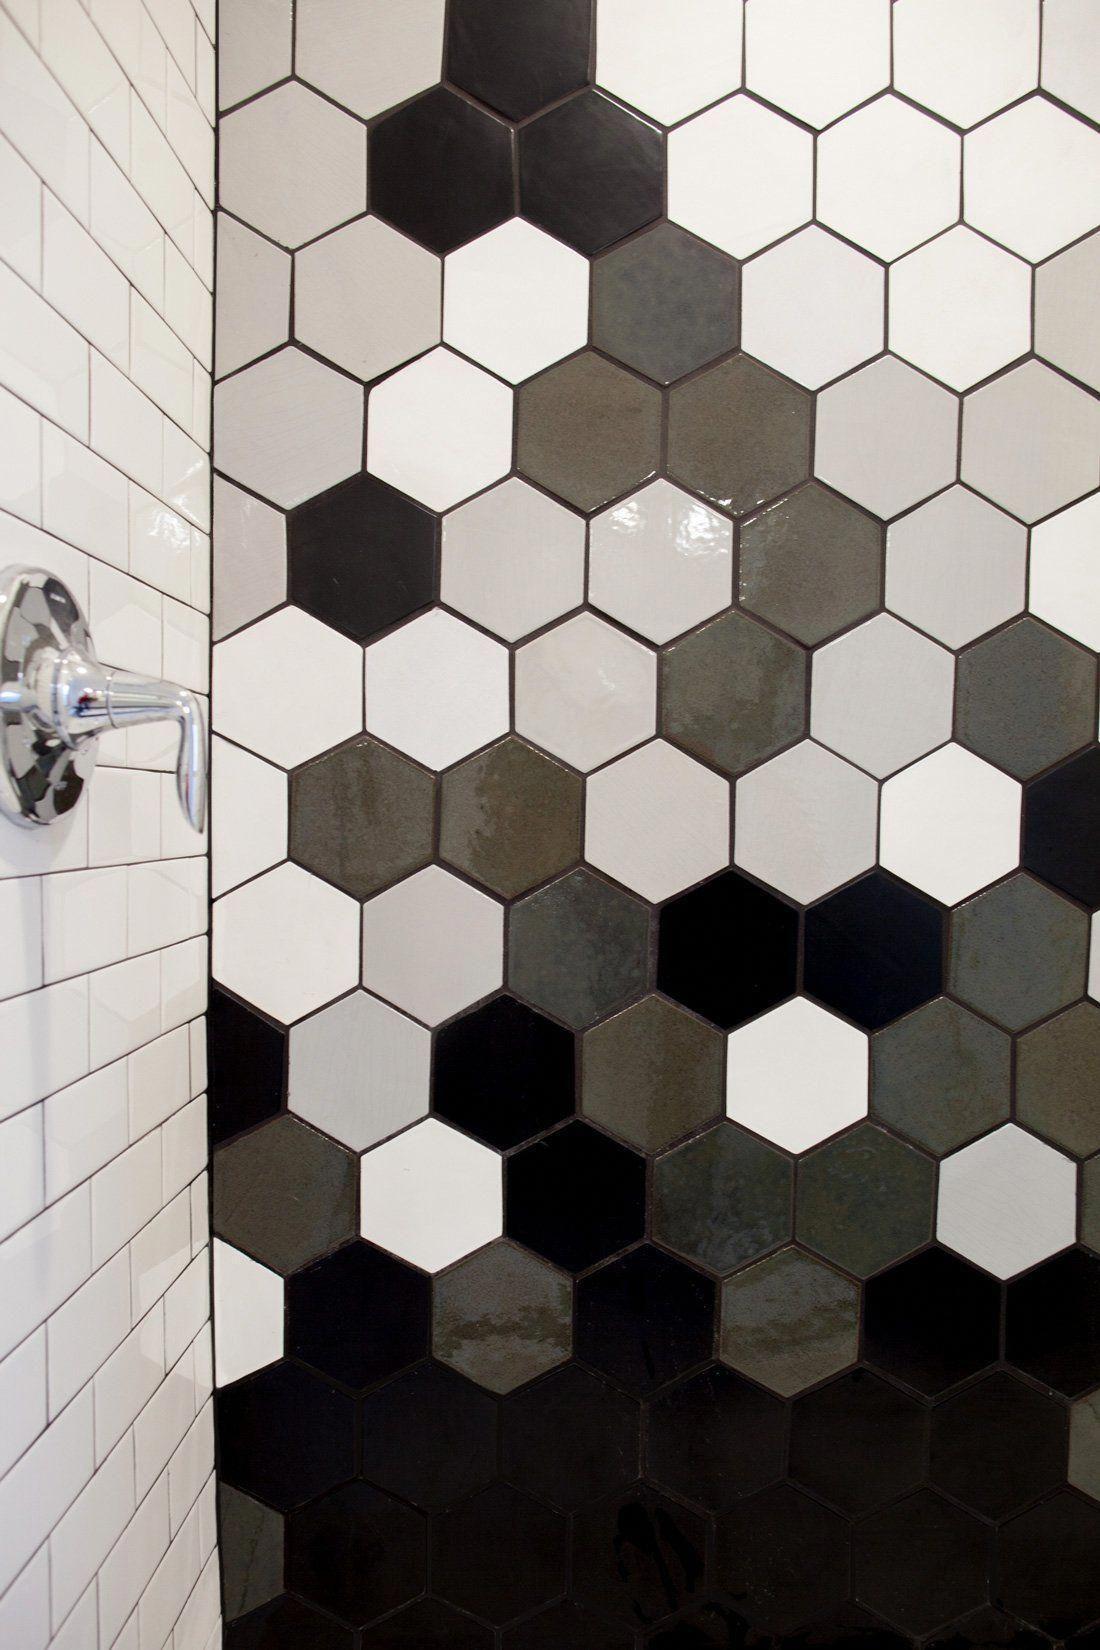 Explore Hexagonal Pattern Bathroom Tile Ideas On Pinterest See More Ideas About Bathroom Tile Ideas Hexagon Tiles Honeycomb Tile Honeycomb Tiles Bathroom,Modern Kitchen Quartz Countertops And Backsplash